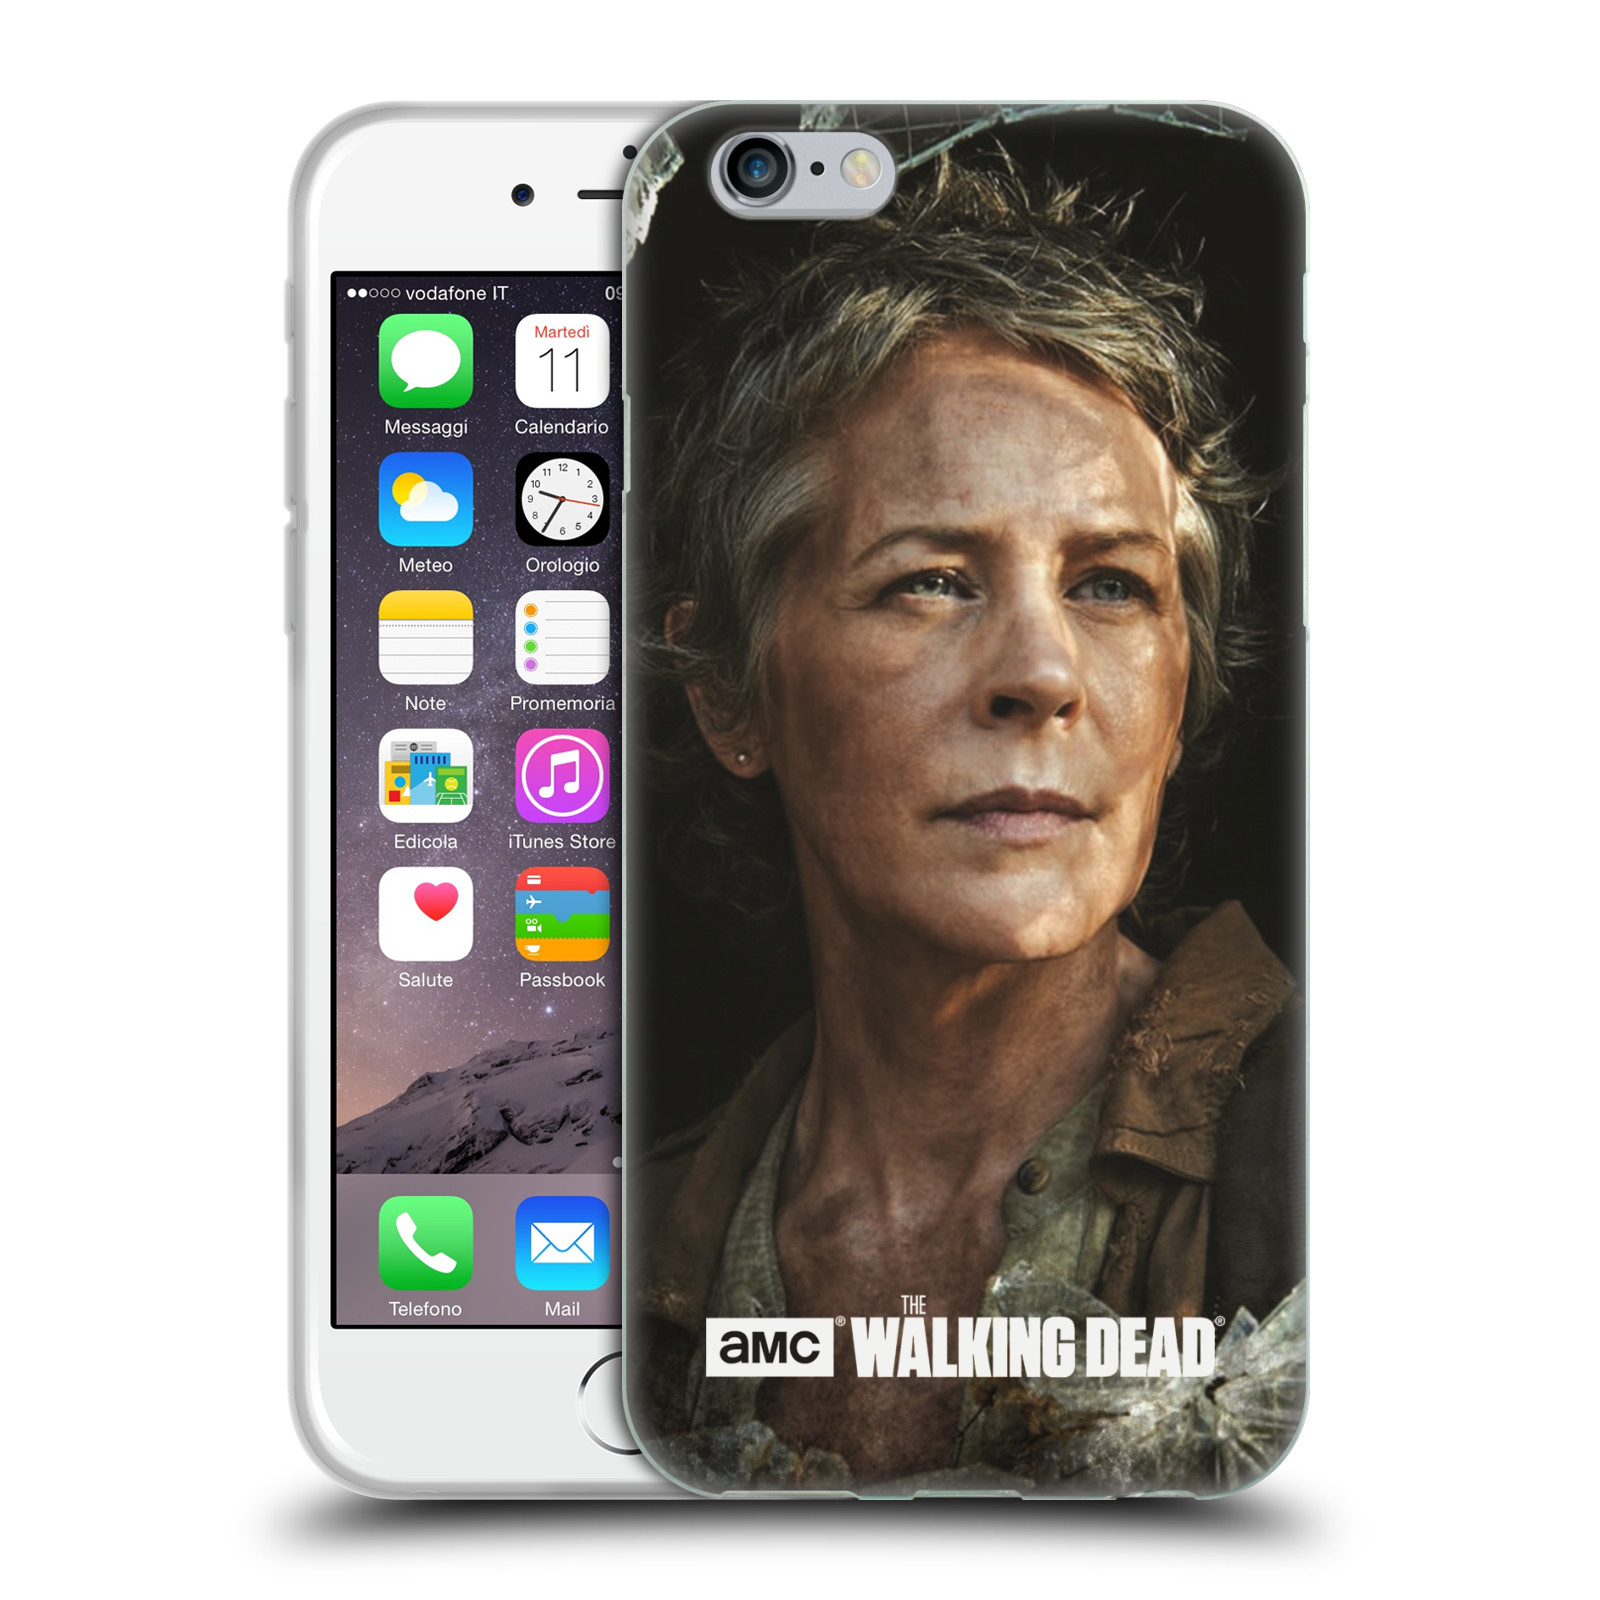 HEAD CASE silikonový obal na mobil Apple Iphone 6 / 6S originální potisk Walking Dead postavy v akci Carol